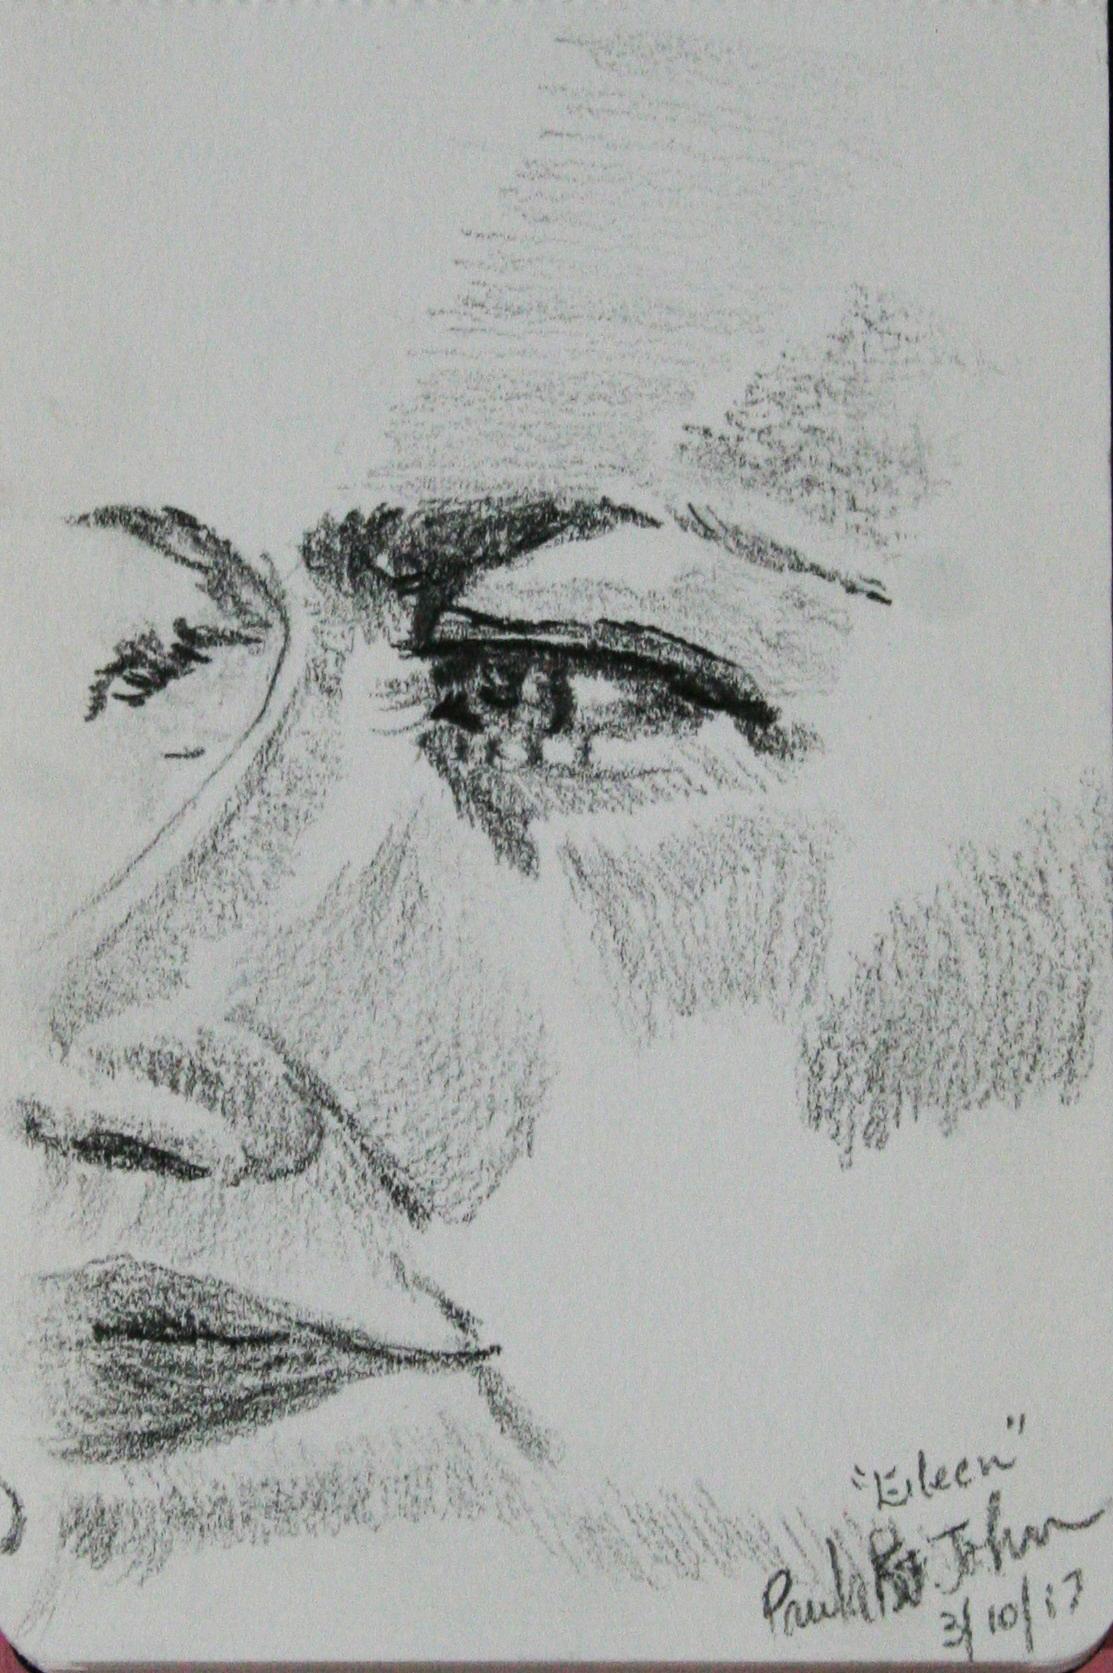 Paula Reed St. John did this sketch.